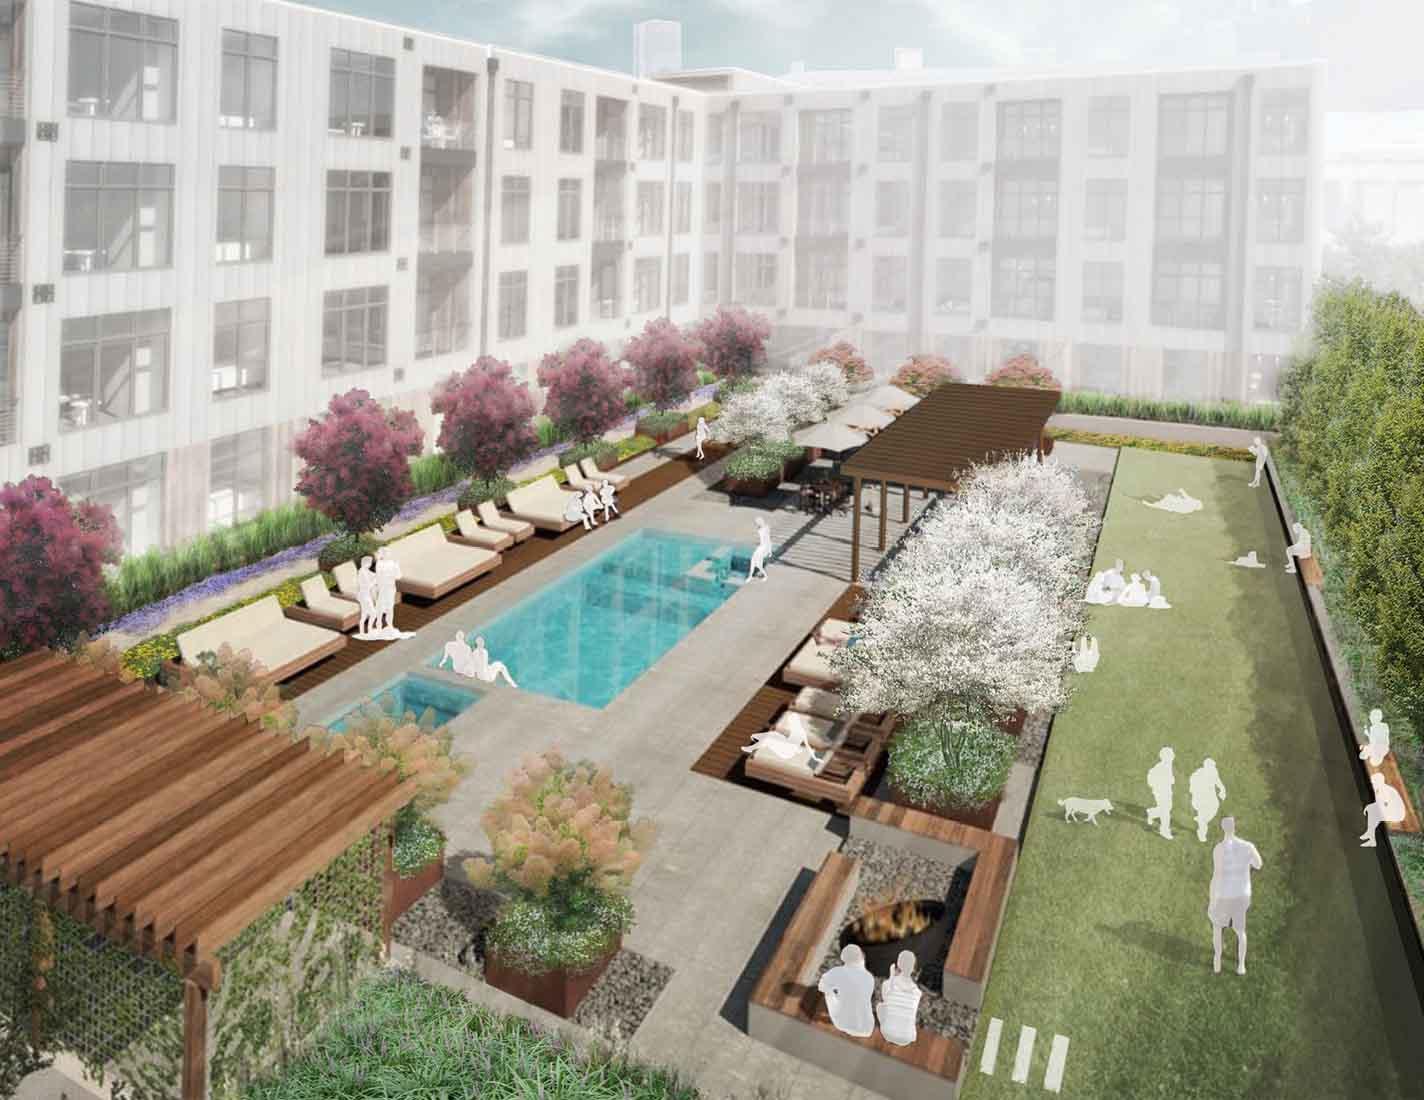 Arbolope Studio | Landscape Architects + Urban Designers | 4101 Laclede Amenity Deck